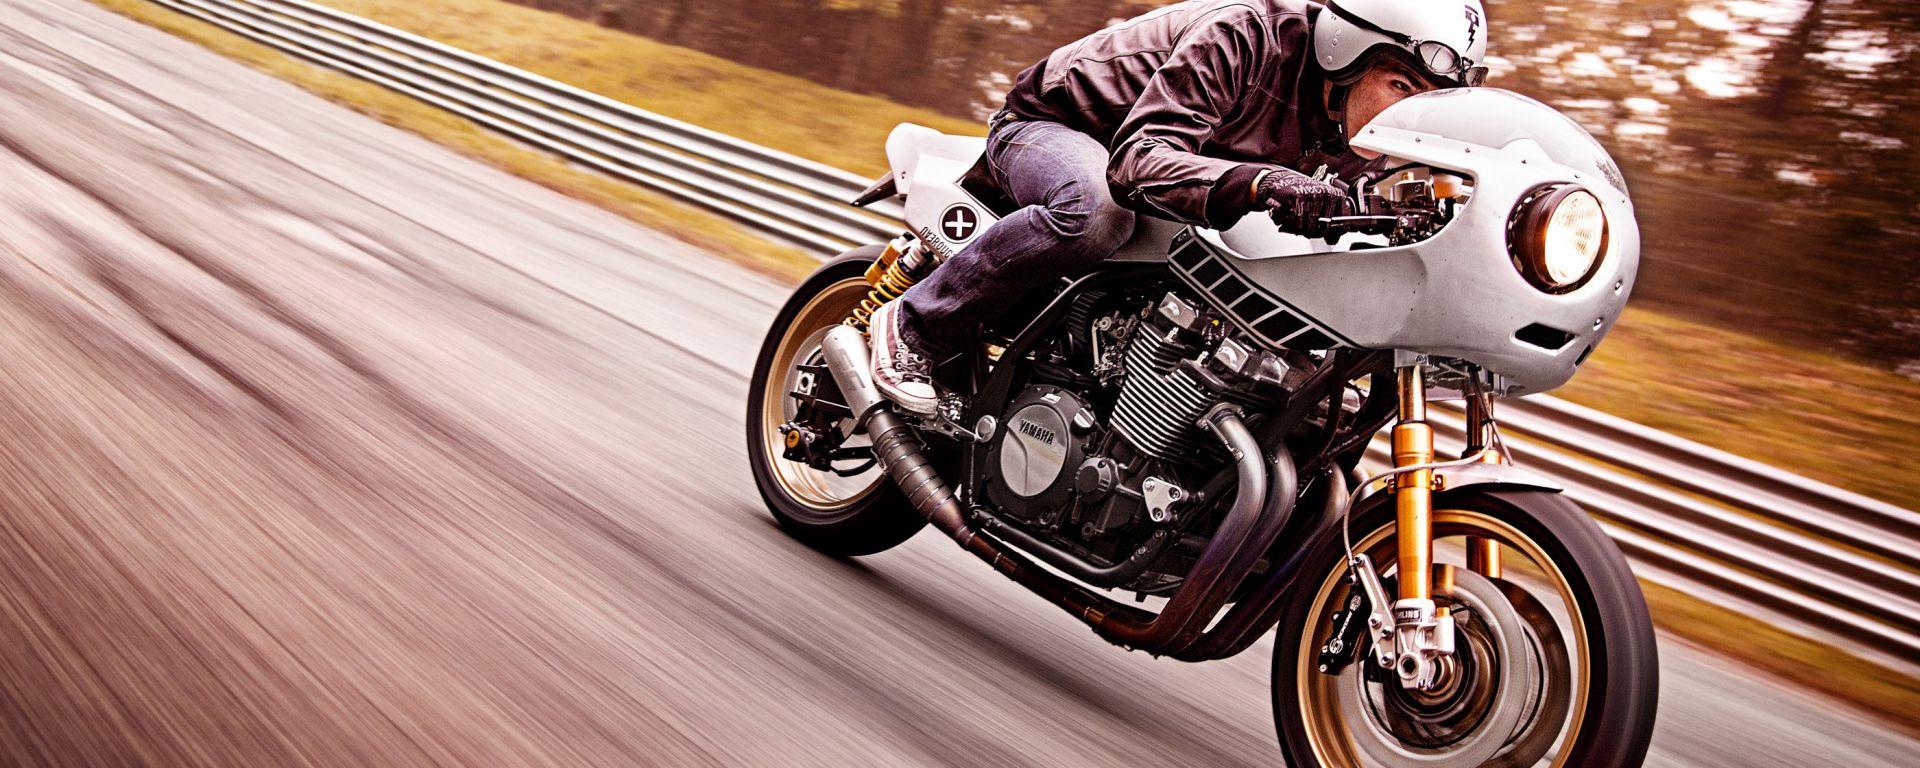 Yamaha XJR1300 Eau Rouge